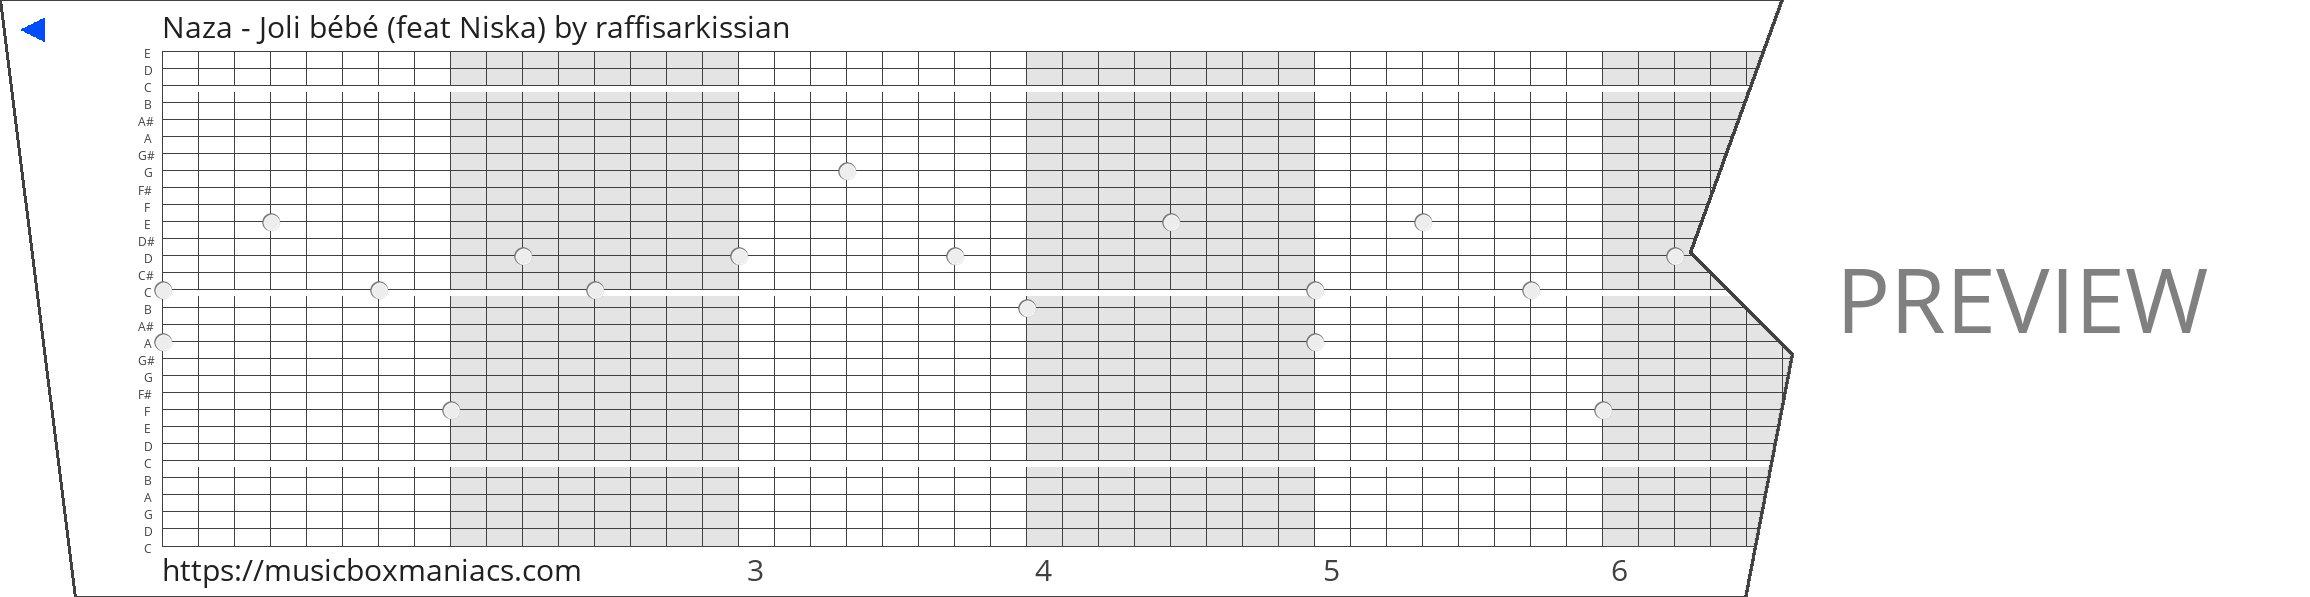 Naza - Joli bébé (feat Niska) 30 note music box paper strip